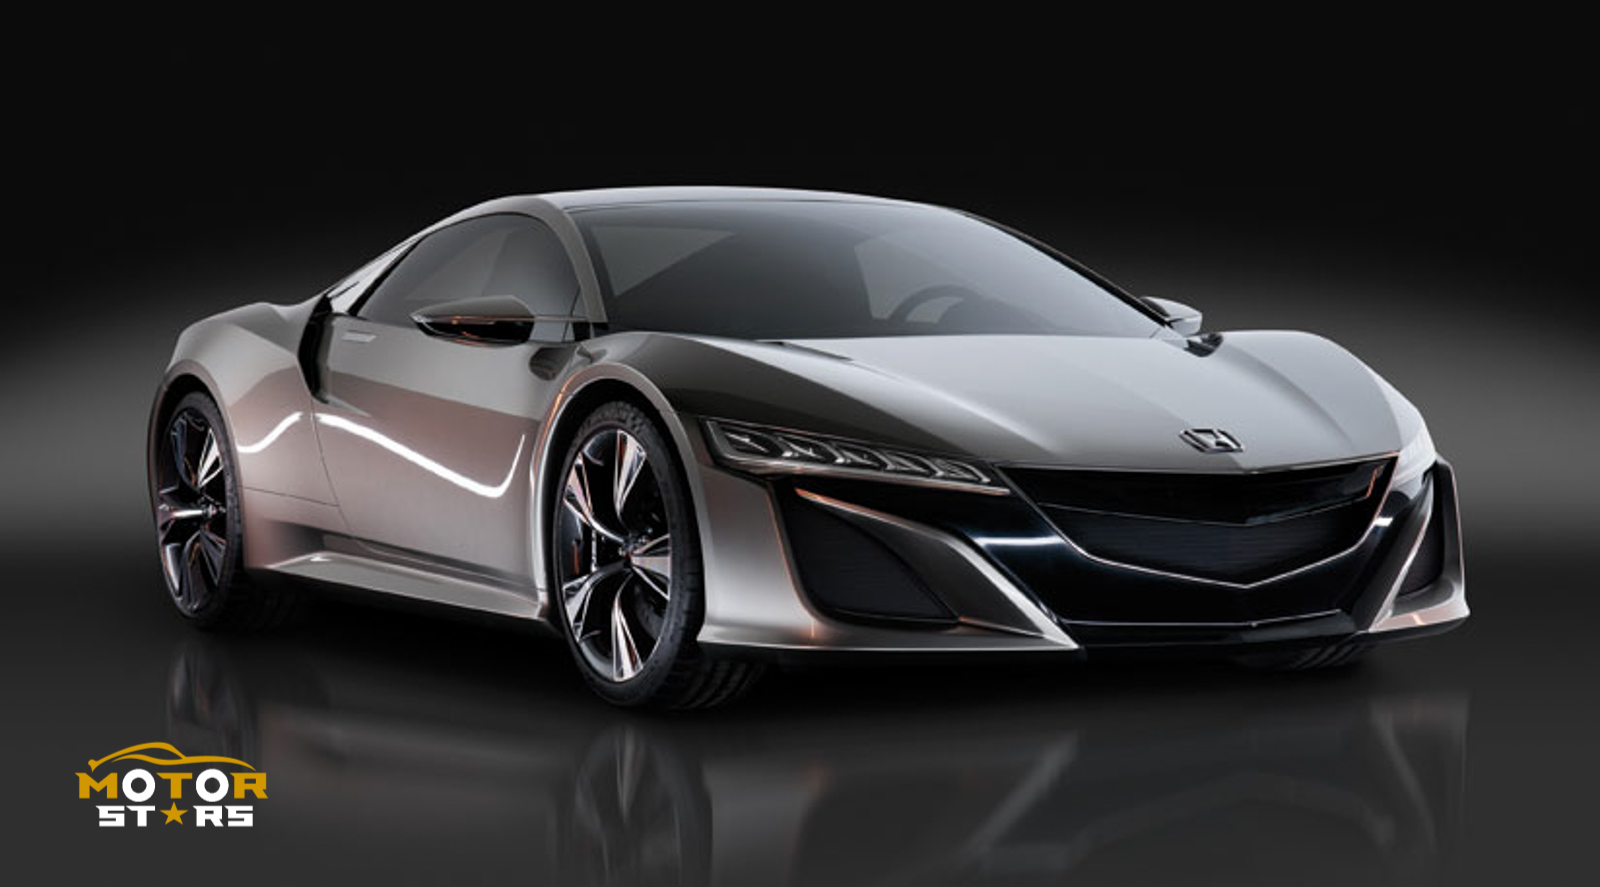 Honda Acura Nsx 2017 Hybrid Electric Supercar 18 Concept Grey Front